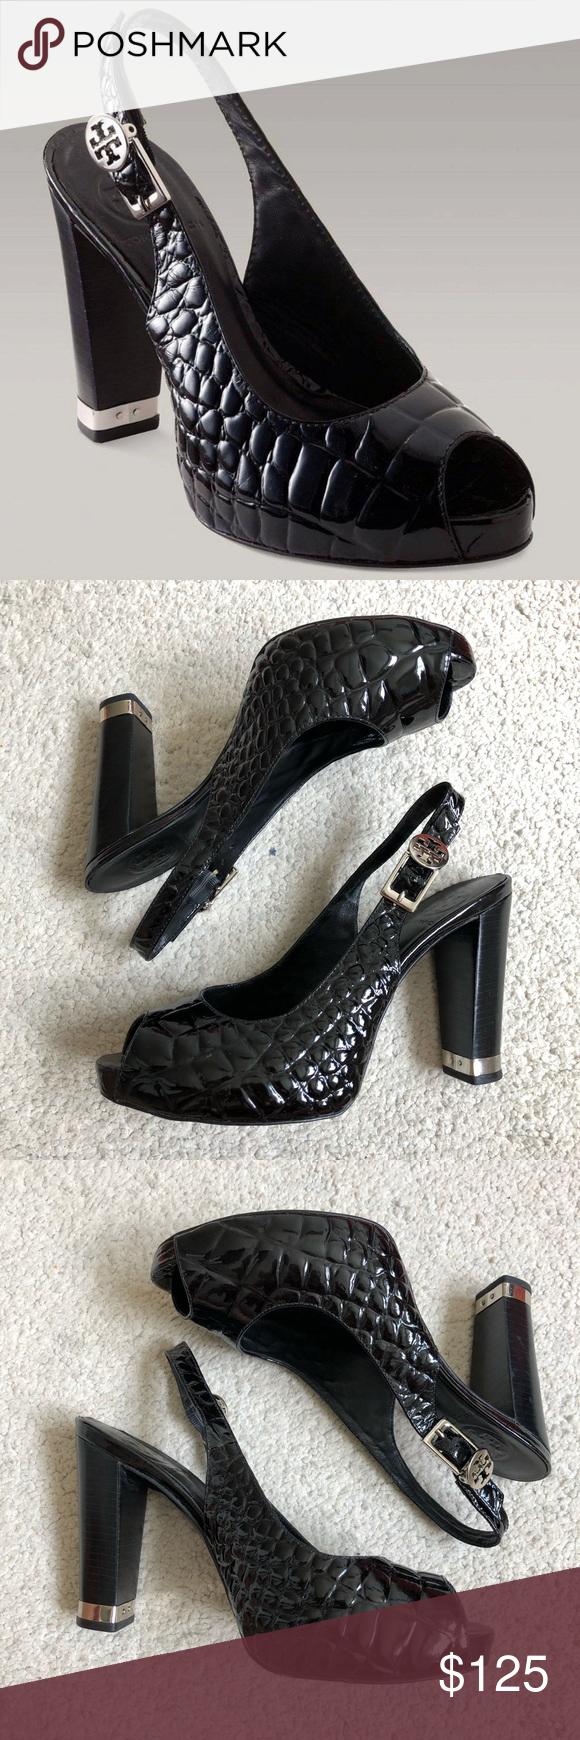 20dbf2b352ca8 Tory Burch Allison Croc Embossed Slingback Pump Black croc embossed peep  toe sling backs